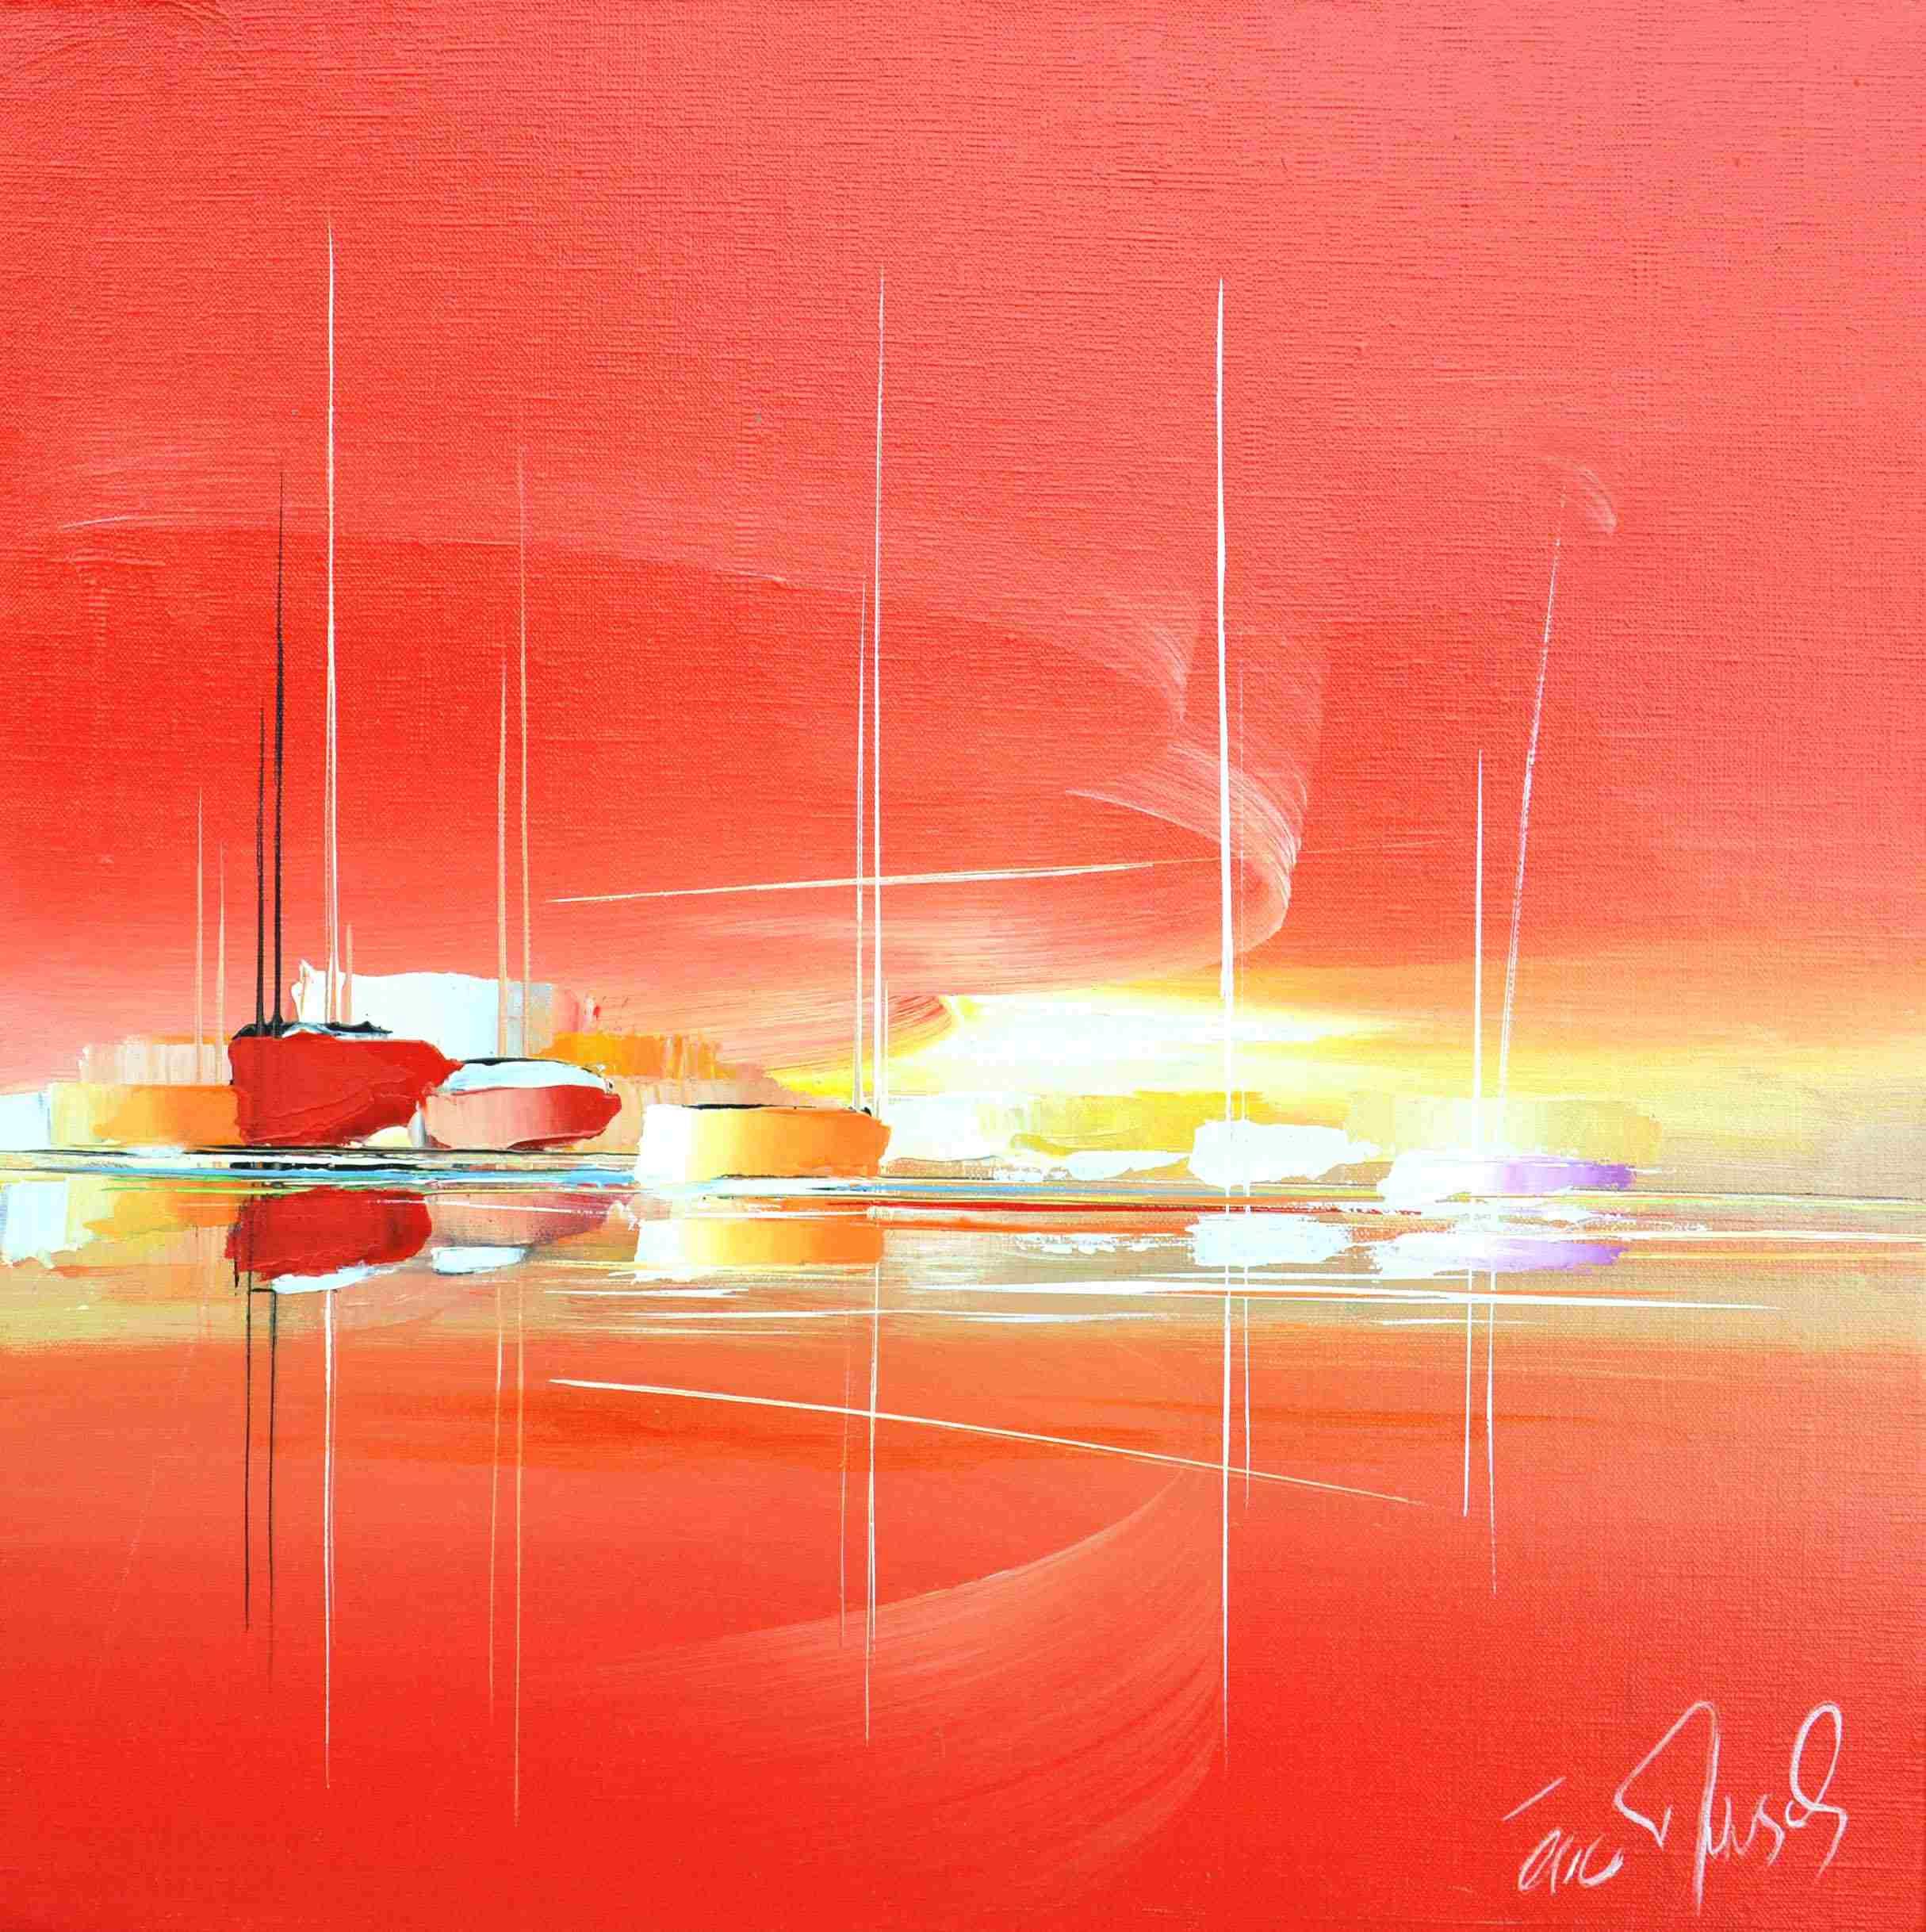 The day dream - Eric Munsch - Acrylique sur toile - 50x50 cm - Galerie Bost